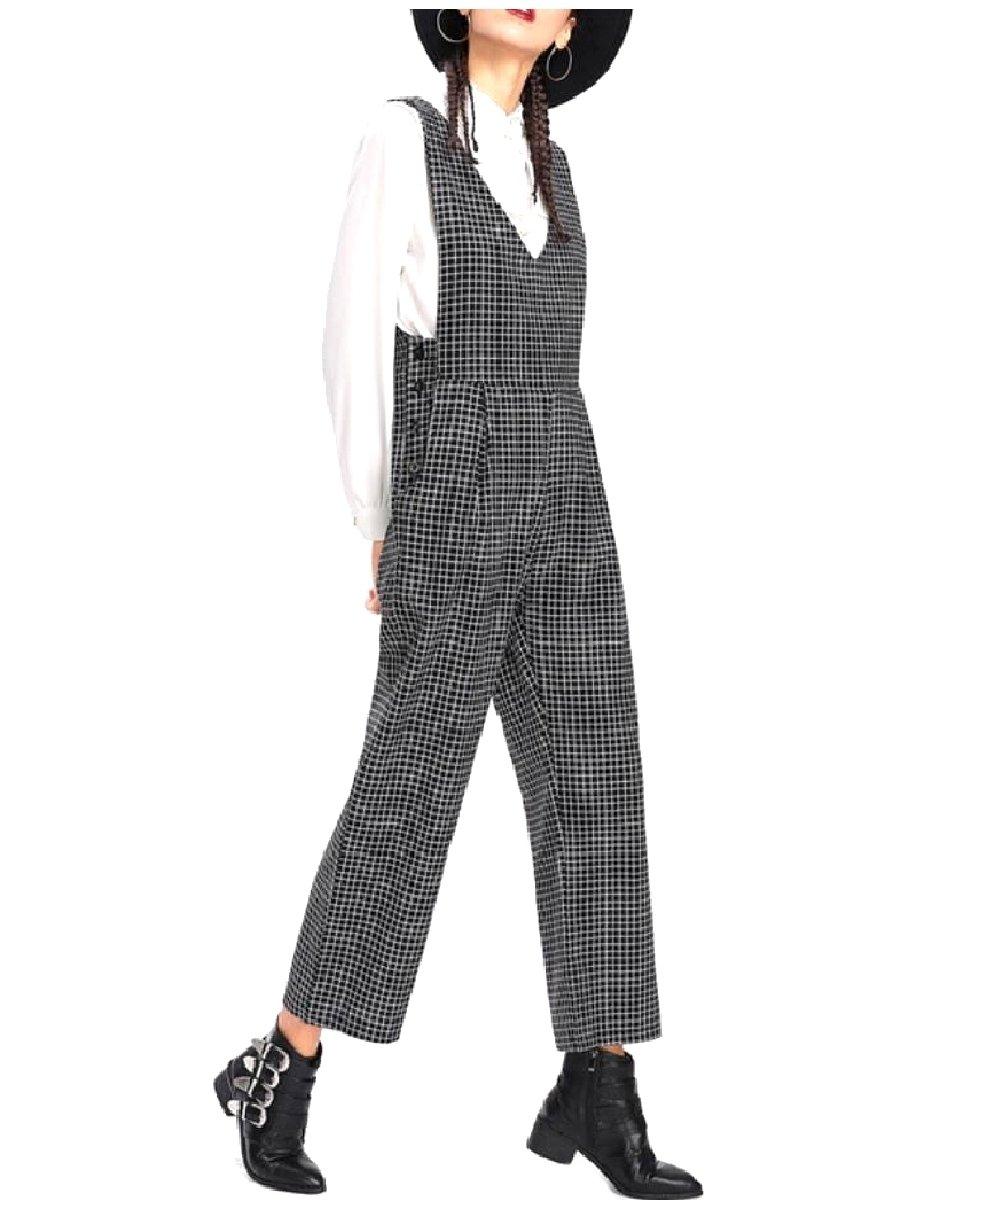 MLG Women's Plaid Vogue Palazzo Fine Cotton Overalls Jumpsuit Pants Dark Grey S